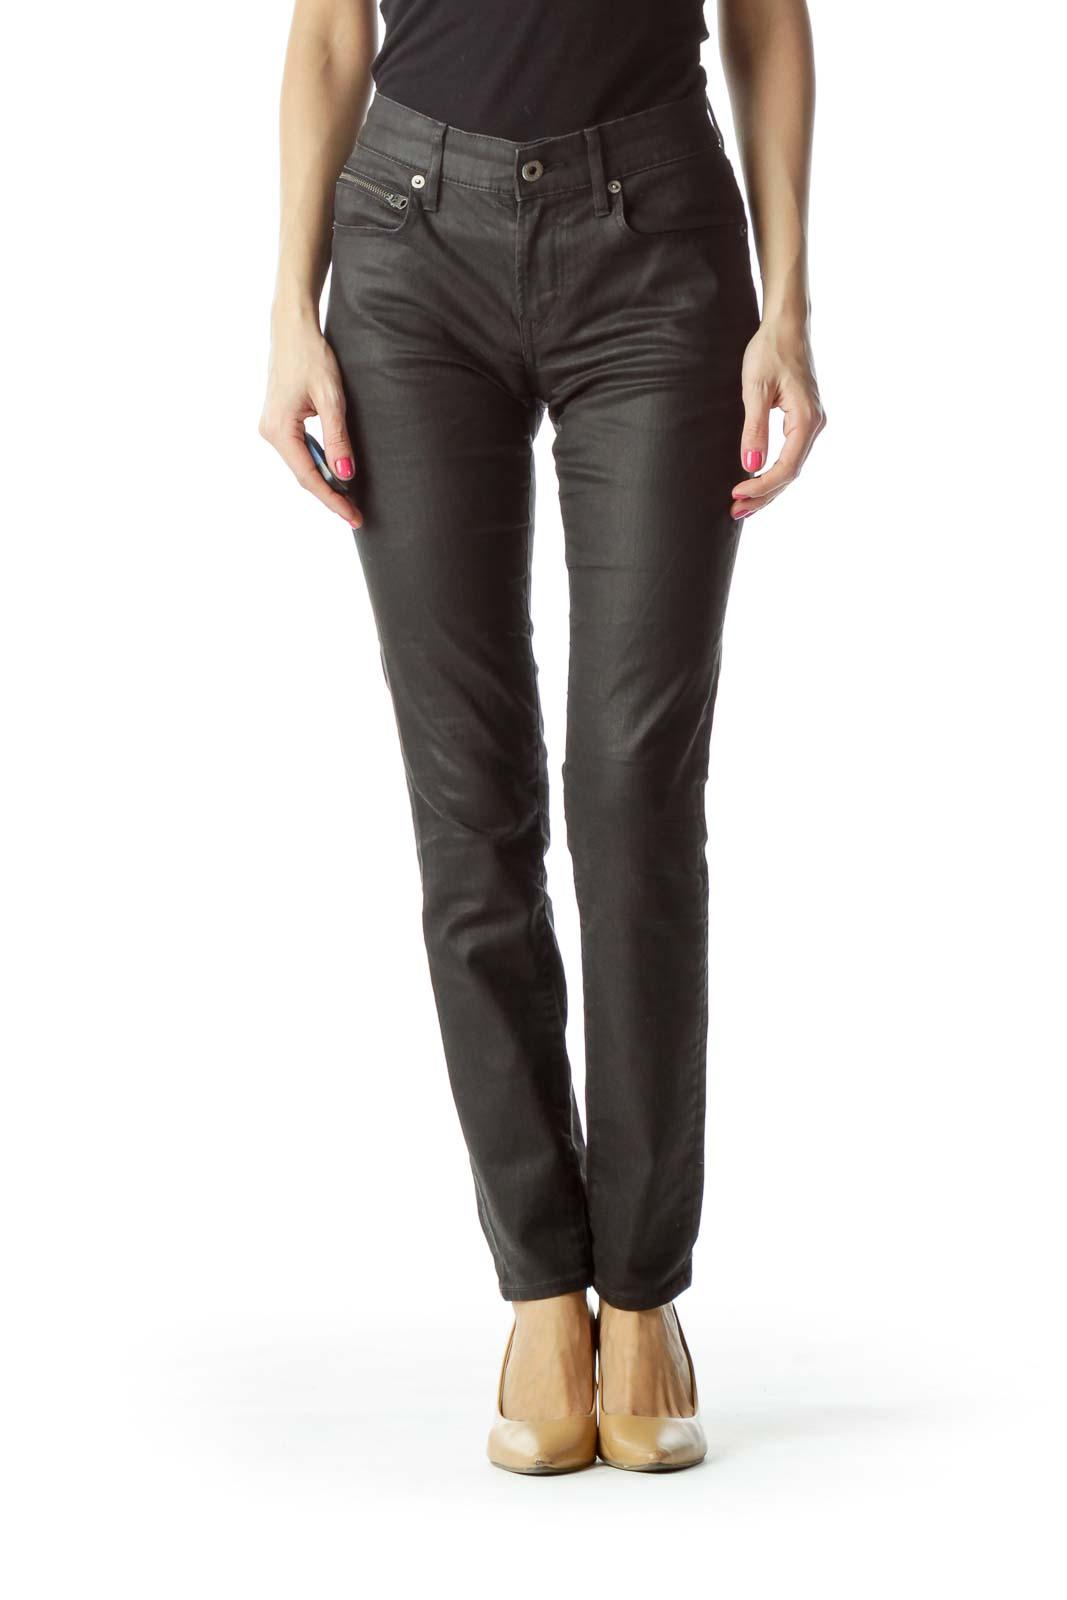 Black Denim Skinny Jeans with Zipper Pockets Front